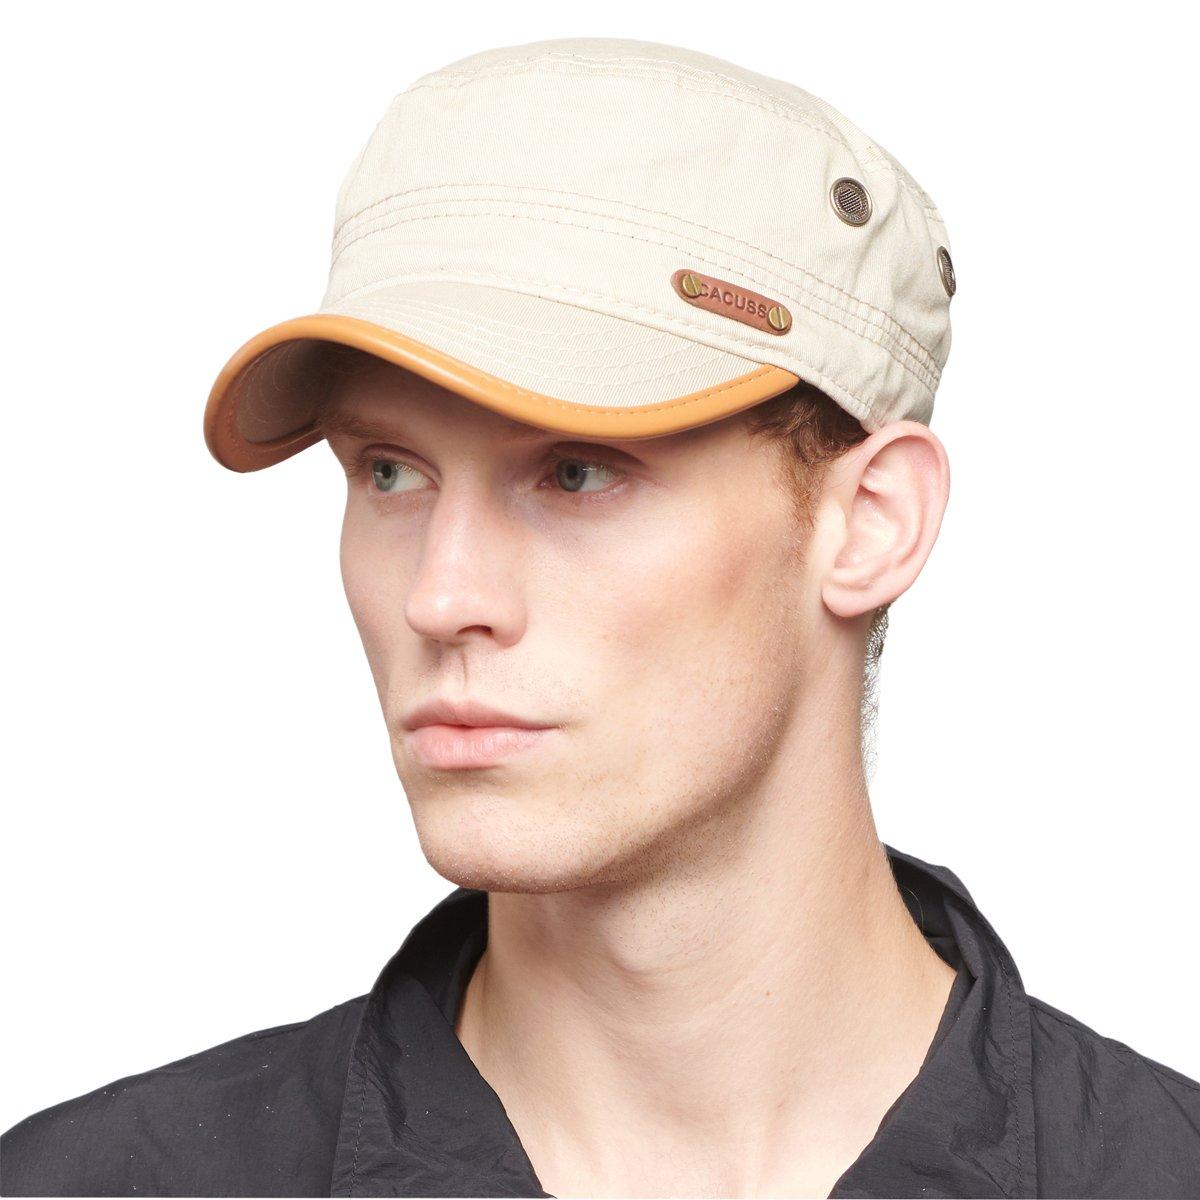 e633bd067e1e9 CACUSS Men s Cotton Army Cap Cadet Hat Military Flat Top Adjustable Baseball  Cap(Beige) at Amazon Men s Clothing store